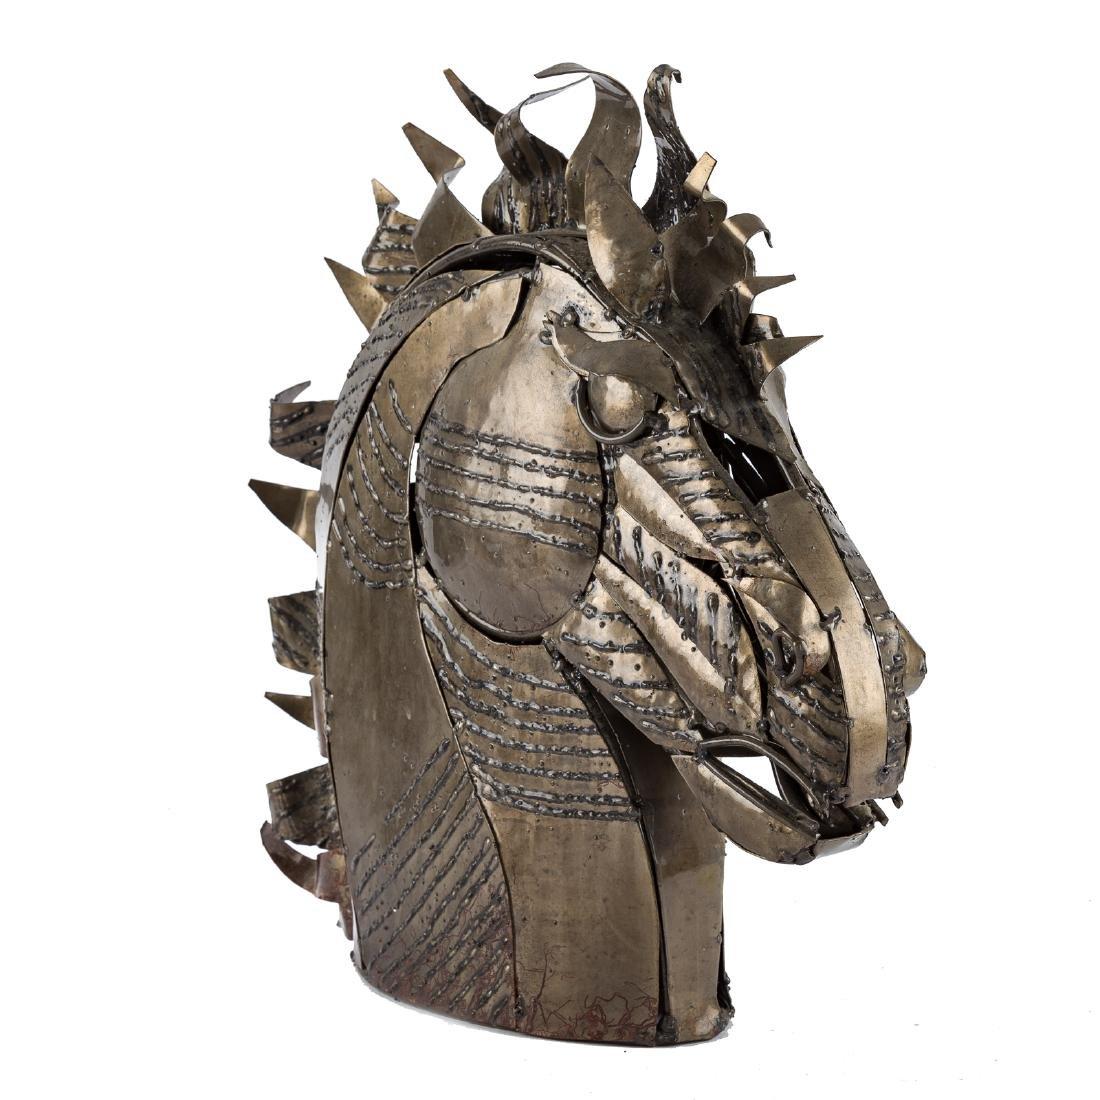 Contemporary School. Bust of Horse, sculpture - 2